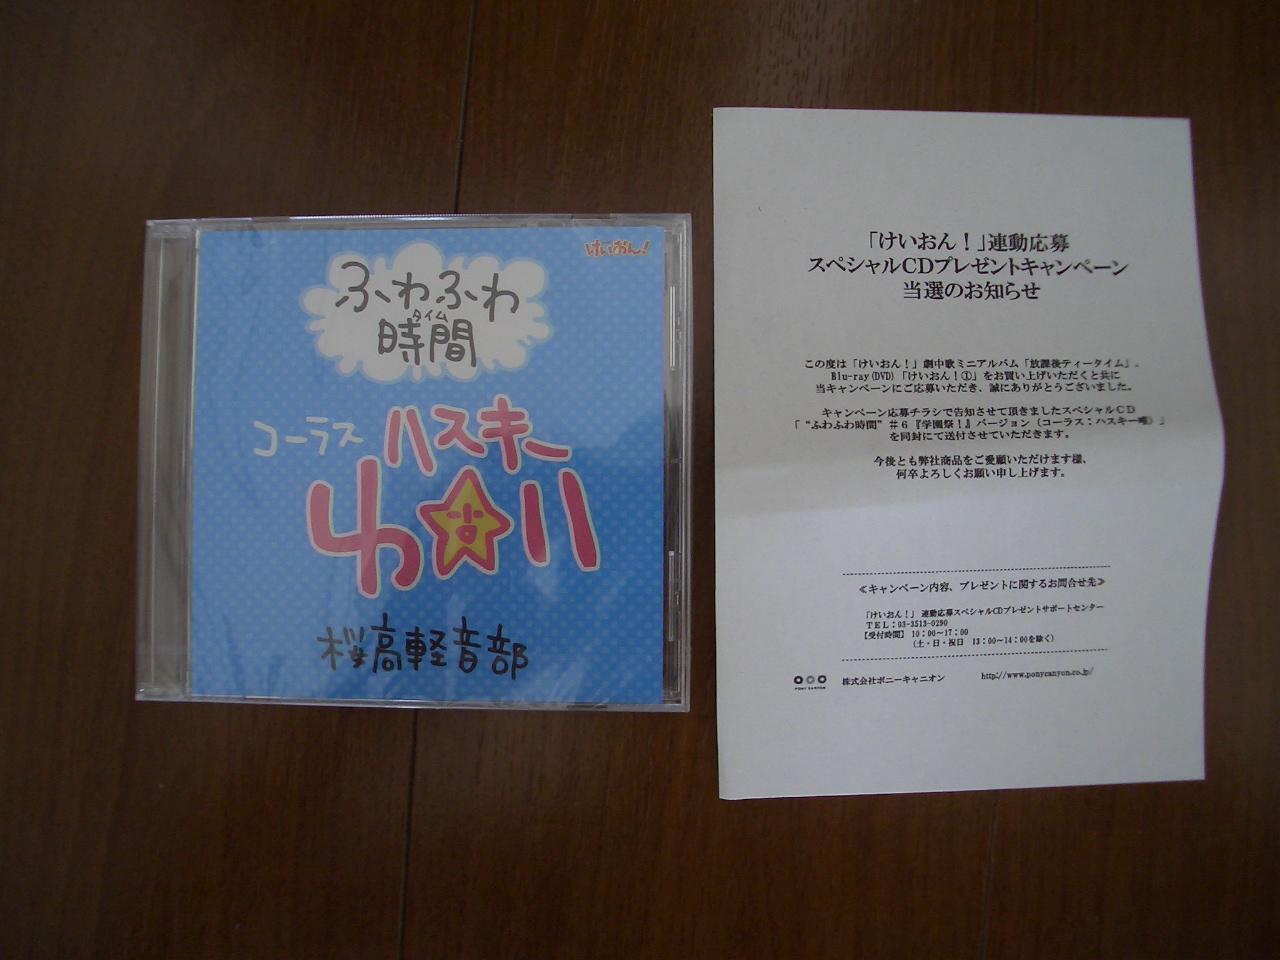 http://www.daimonzi.com/img/husky-yui-front.JPG